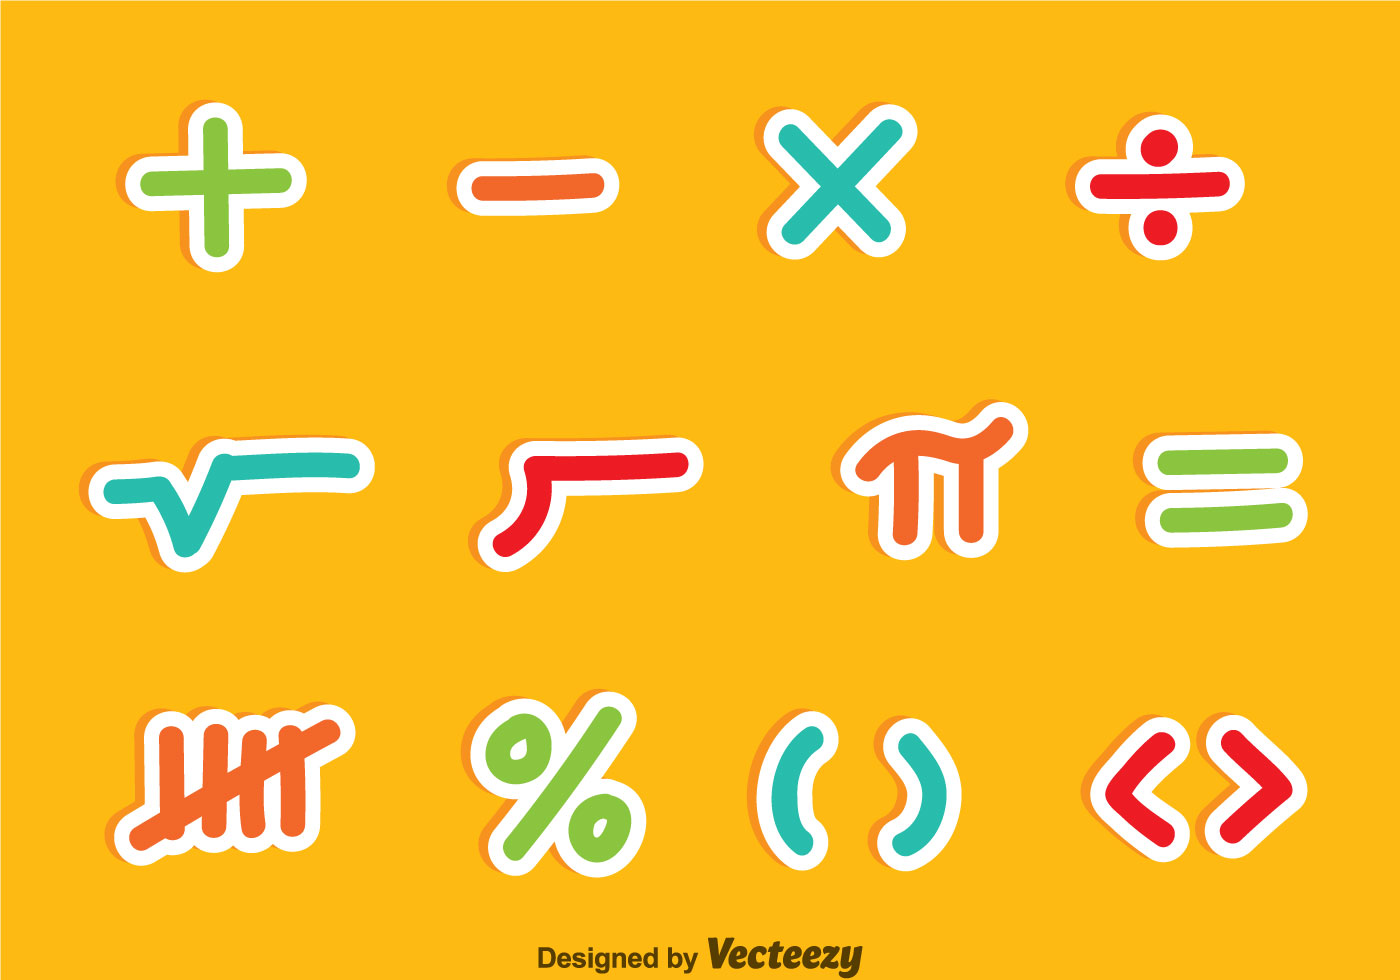 Math symbols colorful vector sets download free vector art stock math symbols colorful vector sets download free vector art stock graphics images buycottarizona Image collections